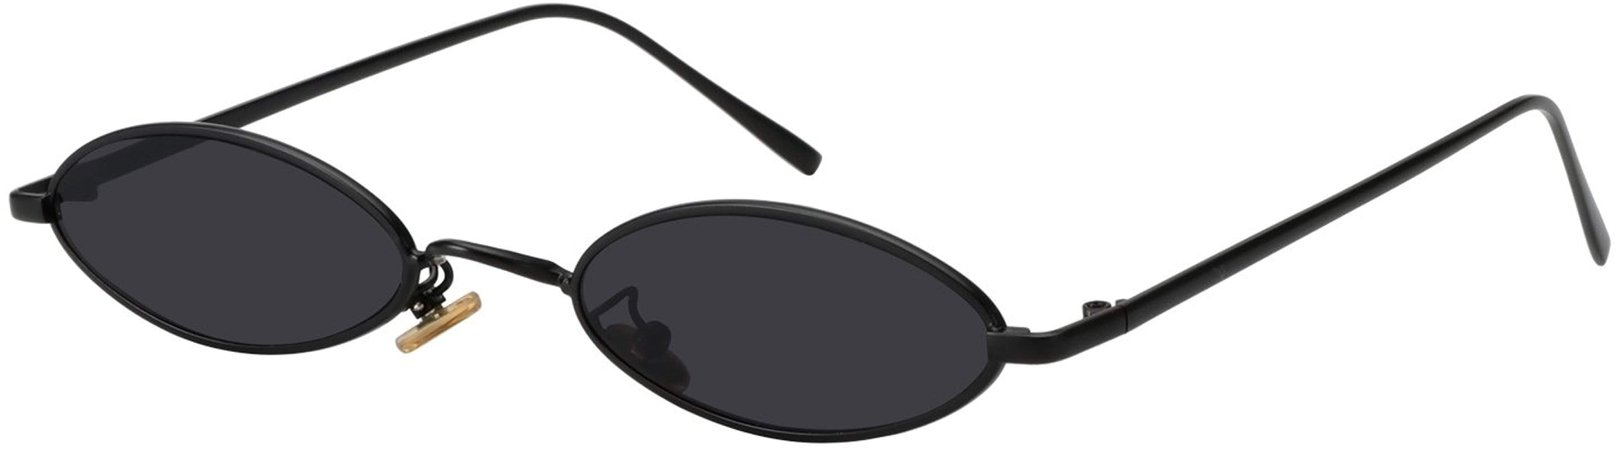 Amazon.com: ROYAL GIRL Vintage Oval Sunglasses Small Metal Frames Designer Gothic Glasses (BLACK GRAY): Clothing